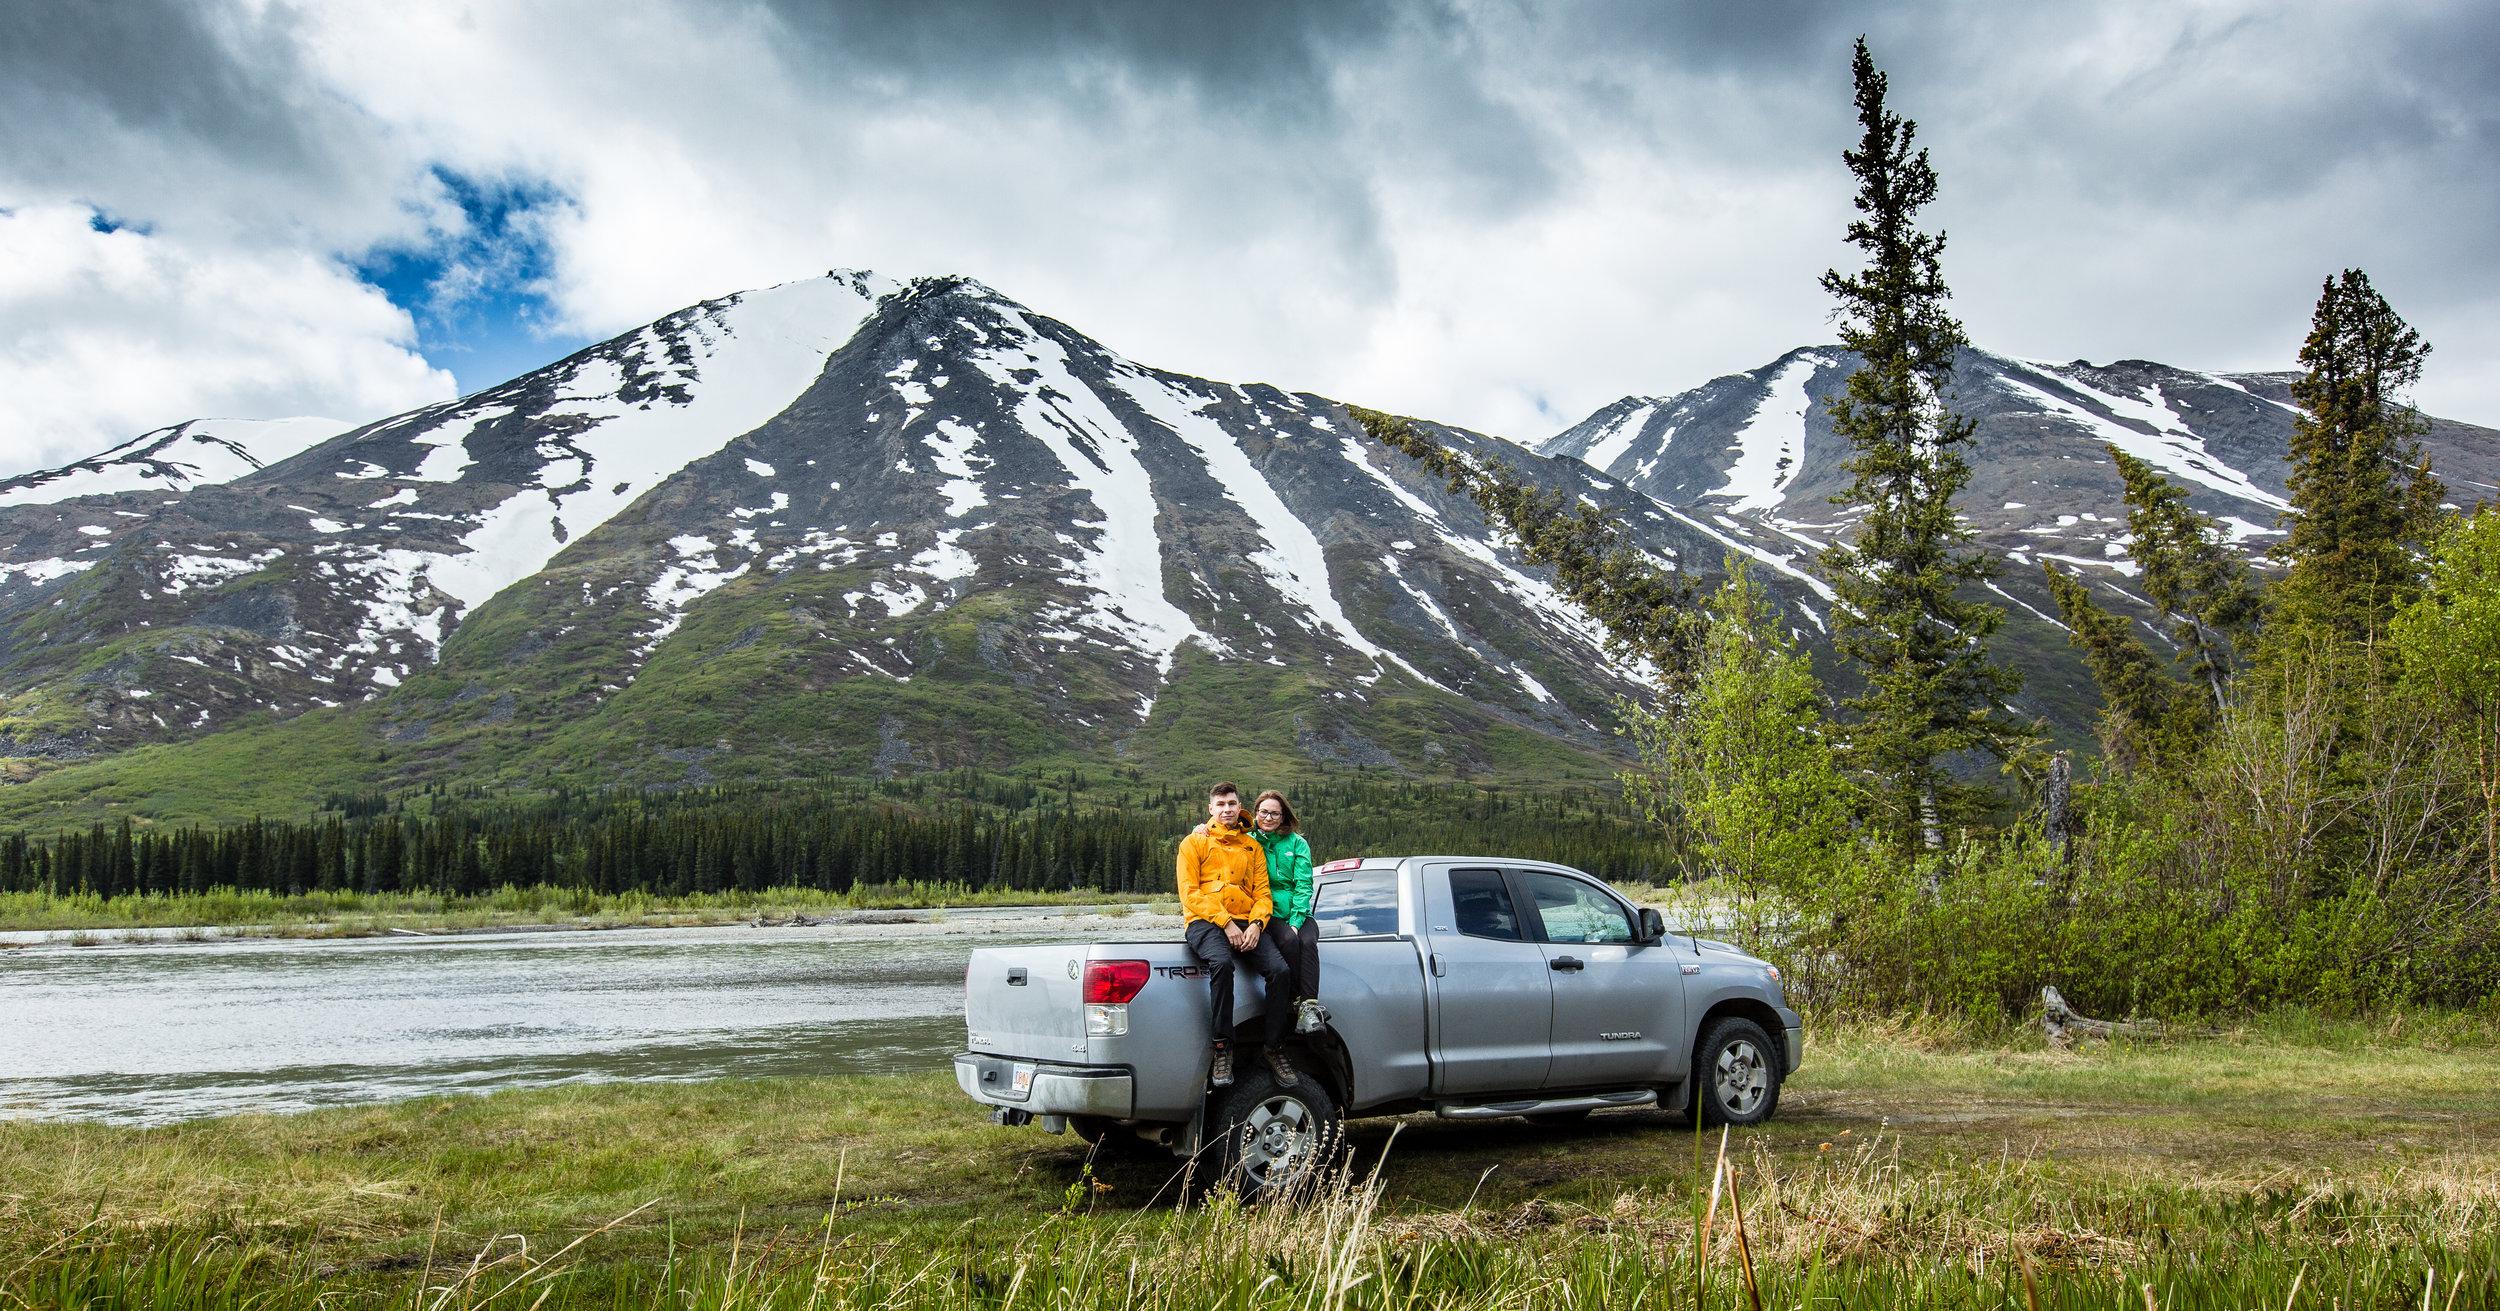 Dude + girl + car + mountains.jpg